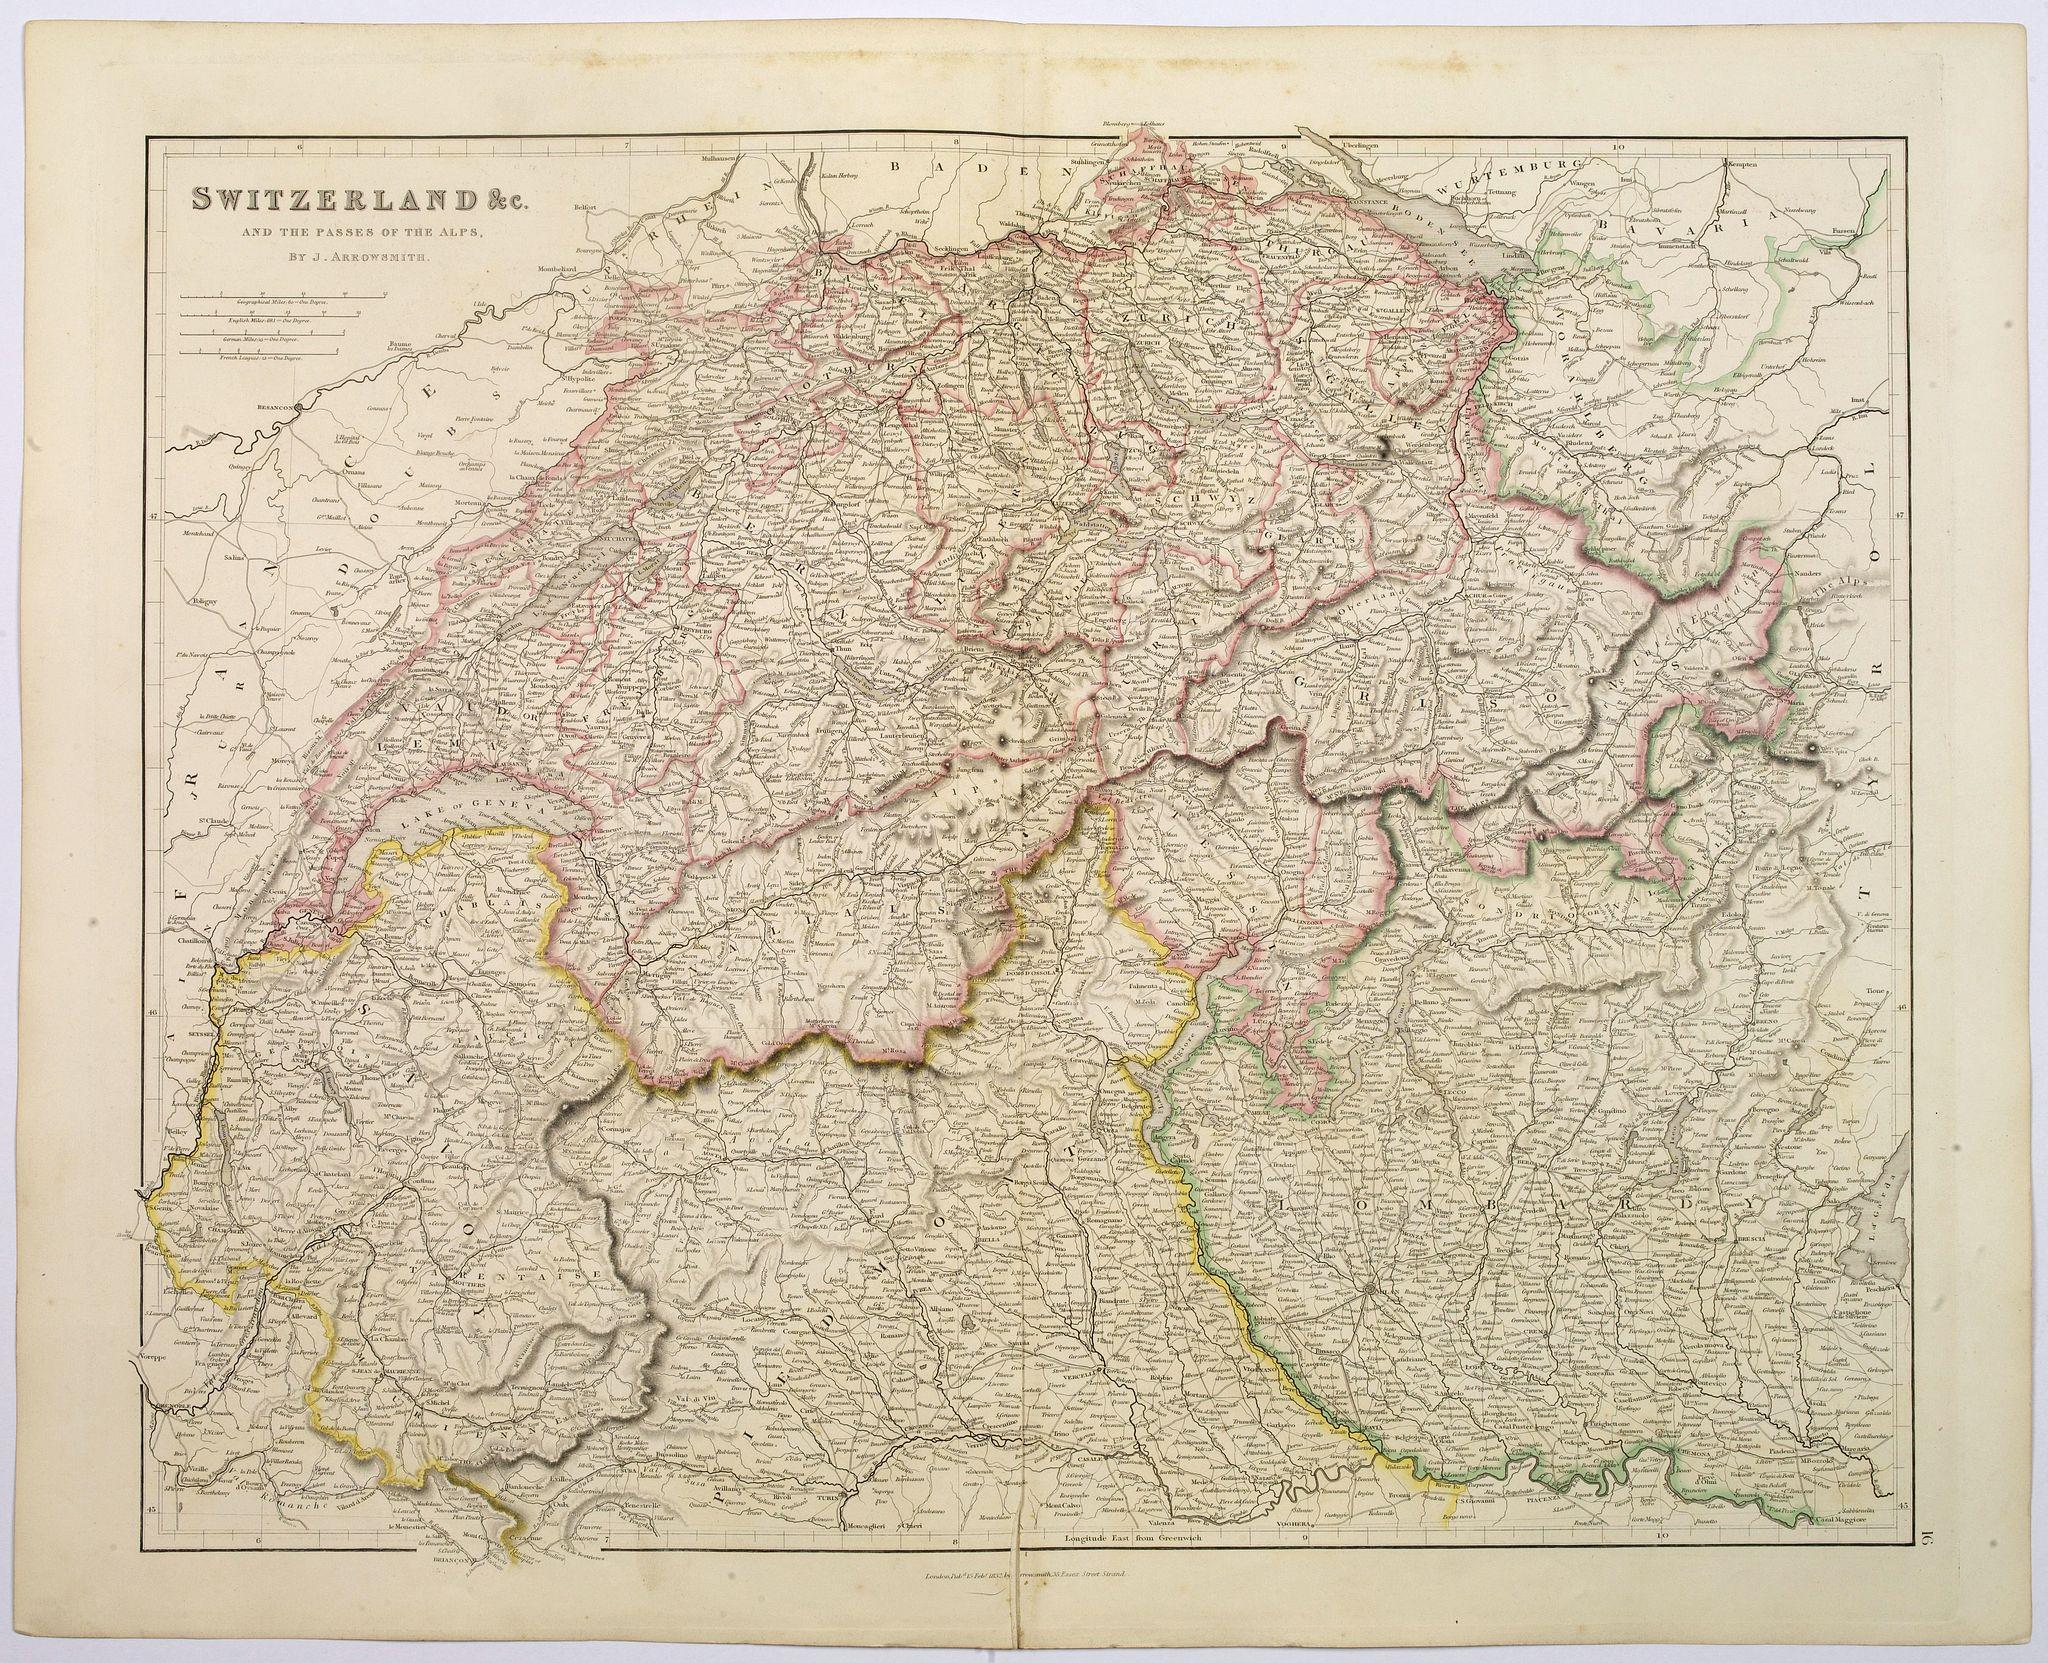 ARROWSMITH, John -  Switzerland &c, and the Passes of The Alps.